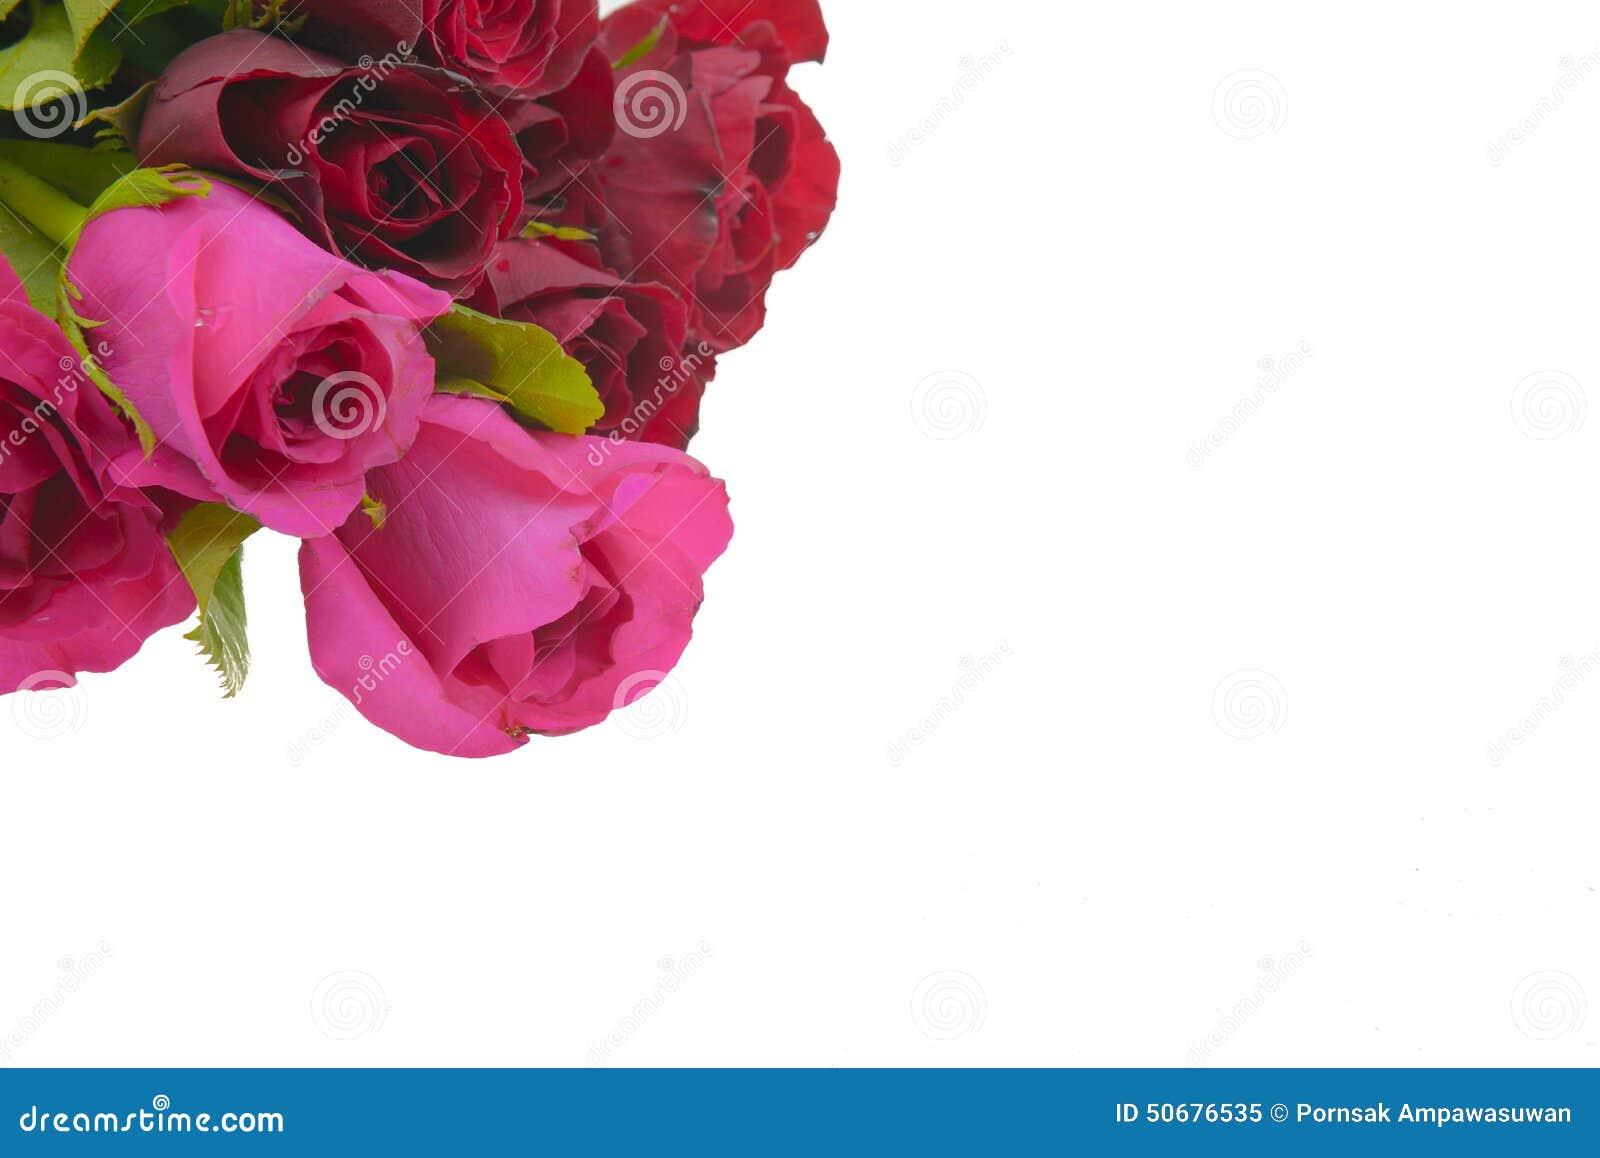 Download 罗斯 库存图片. 图片 包括有 庆祝, 设计, 存在, 礼品, 明信片, 生日, beauvoir, beautifuler - 50676535